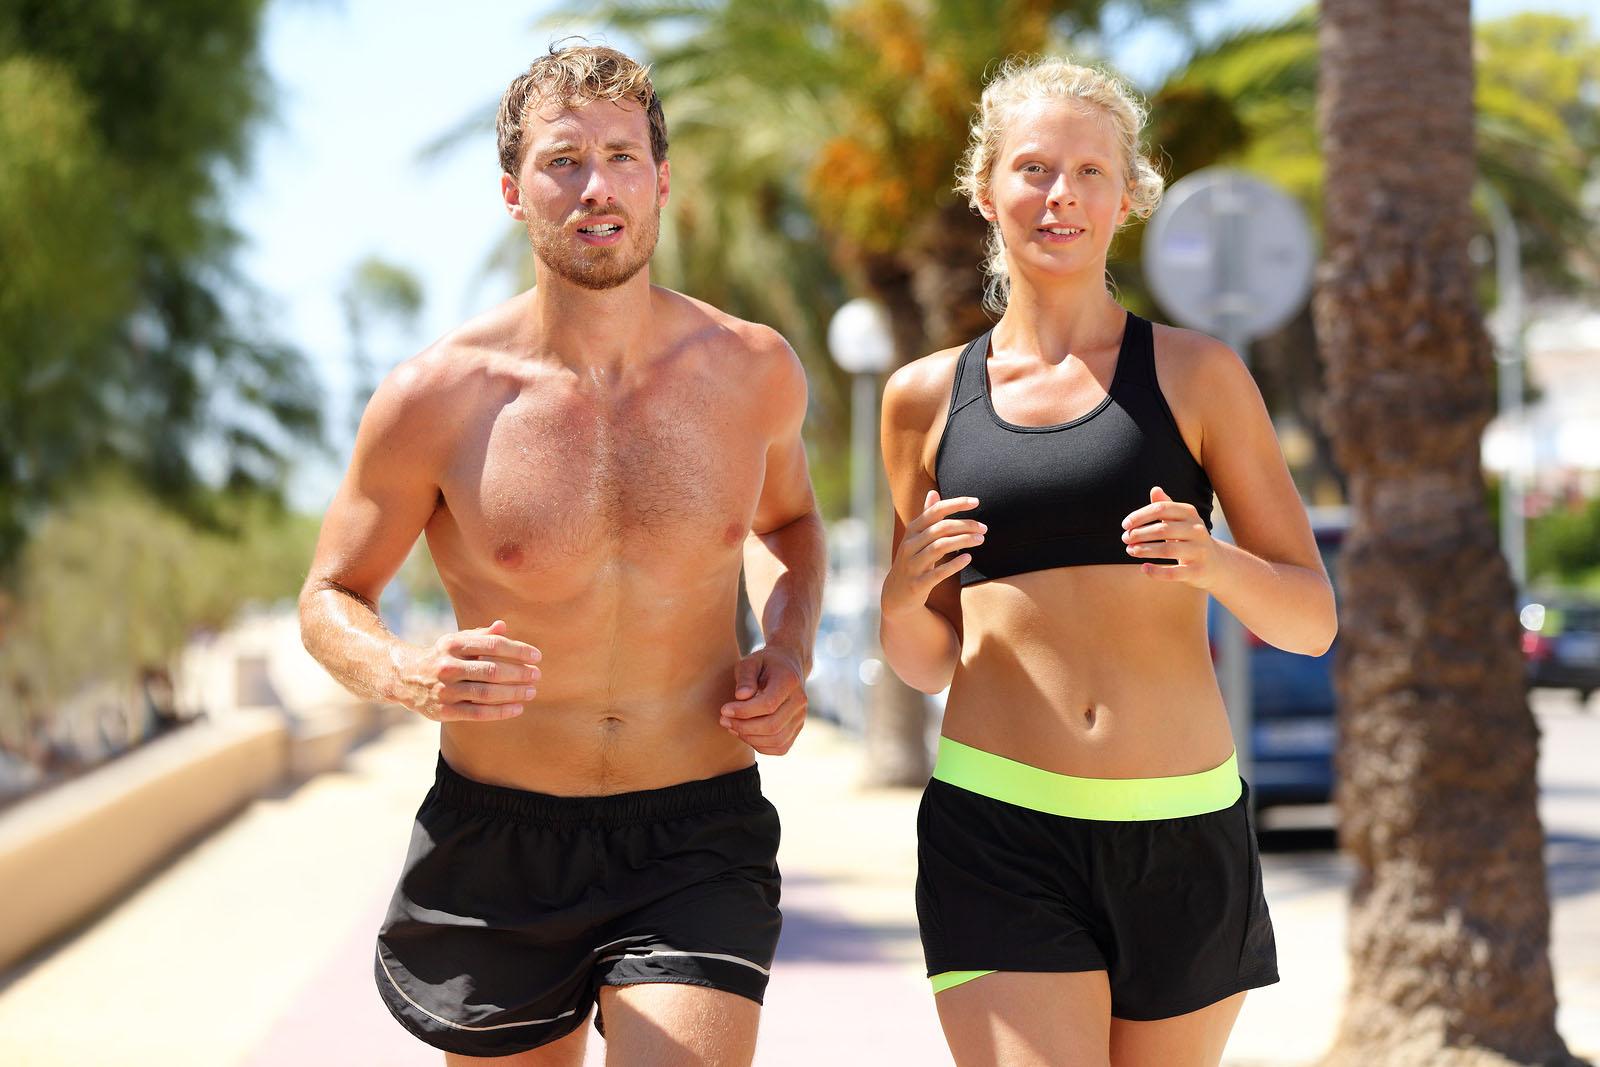 maraton-ny-runners-correr-dieta-genetica-nutricion-celular-bioclinica-marbella